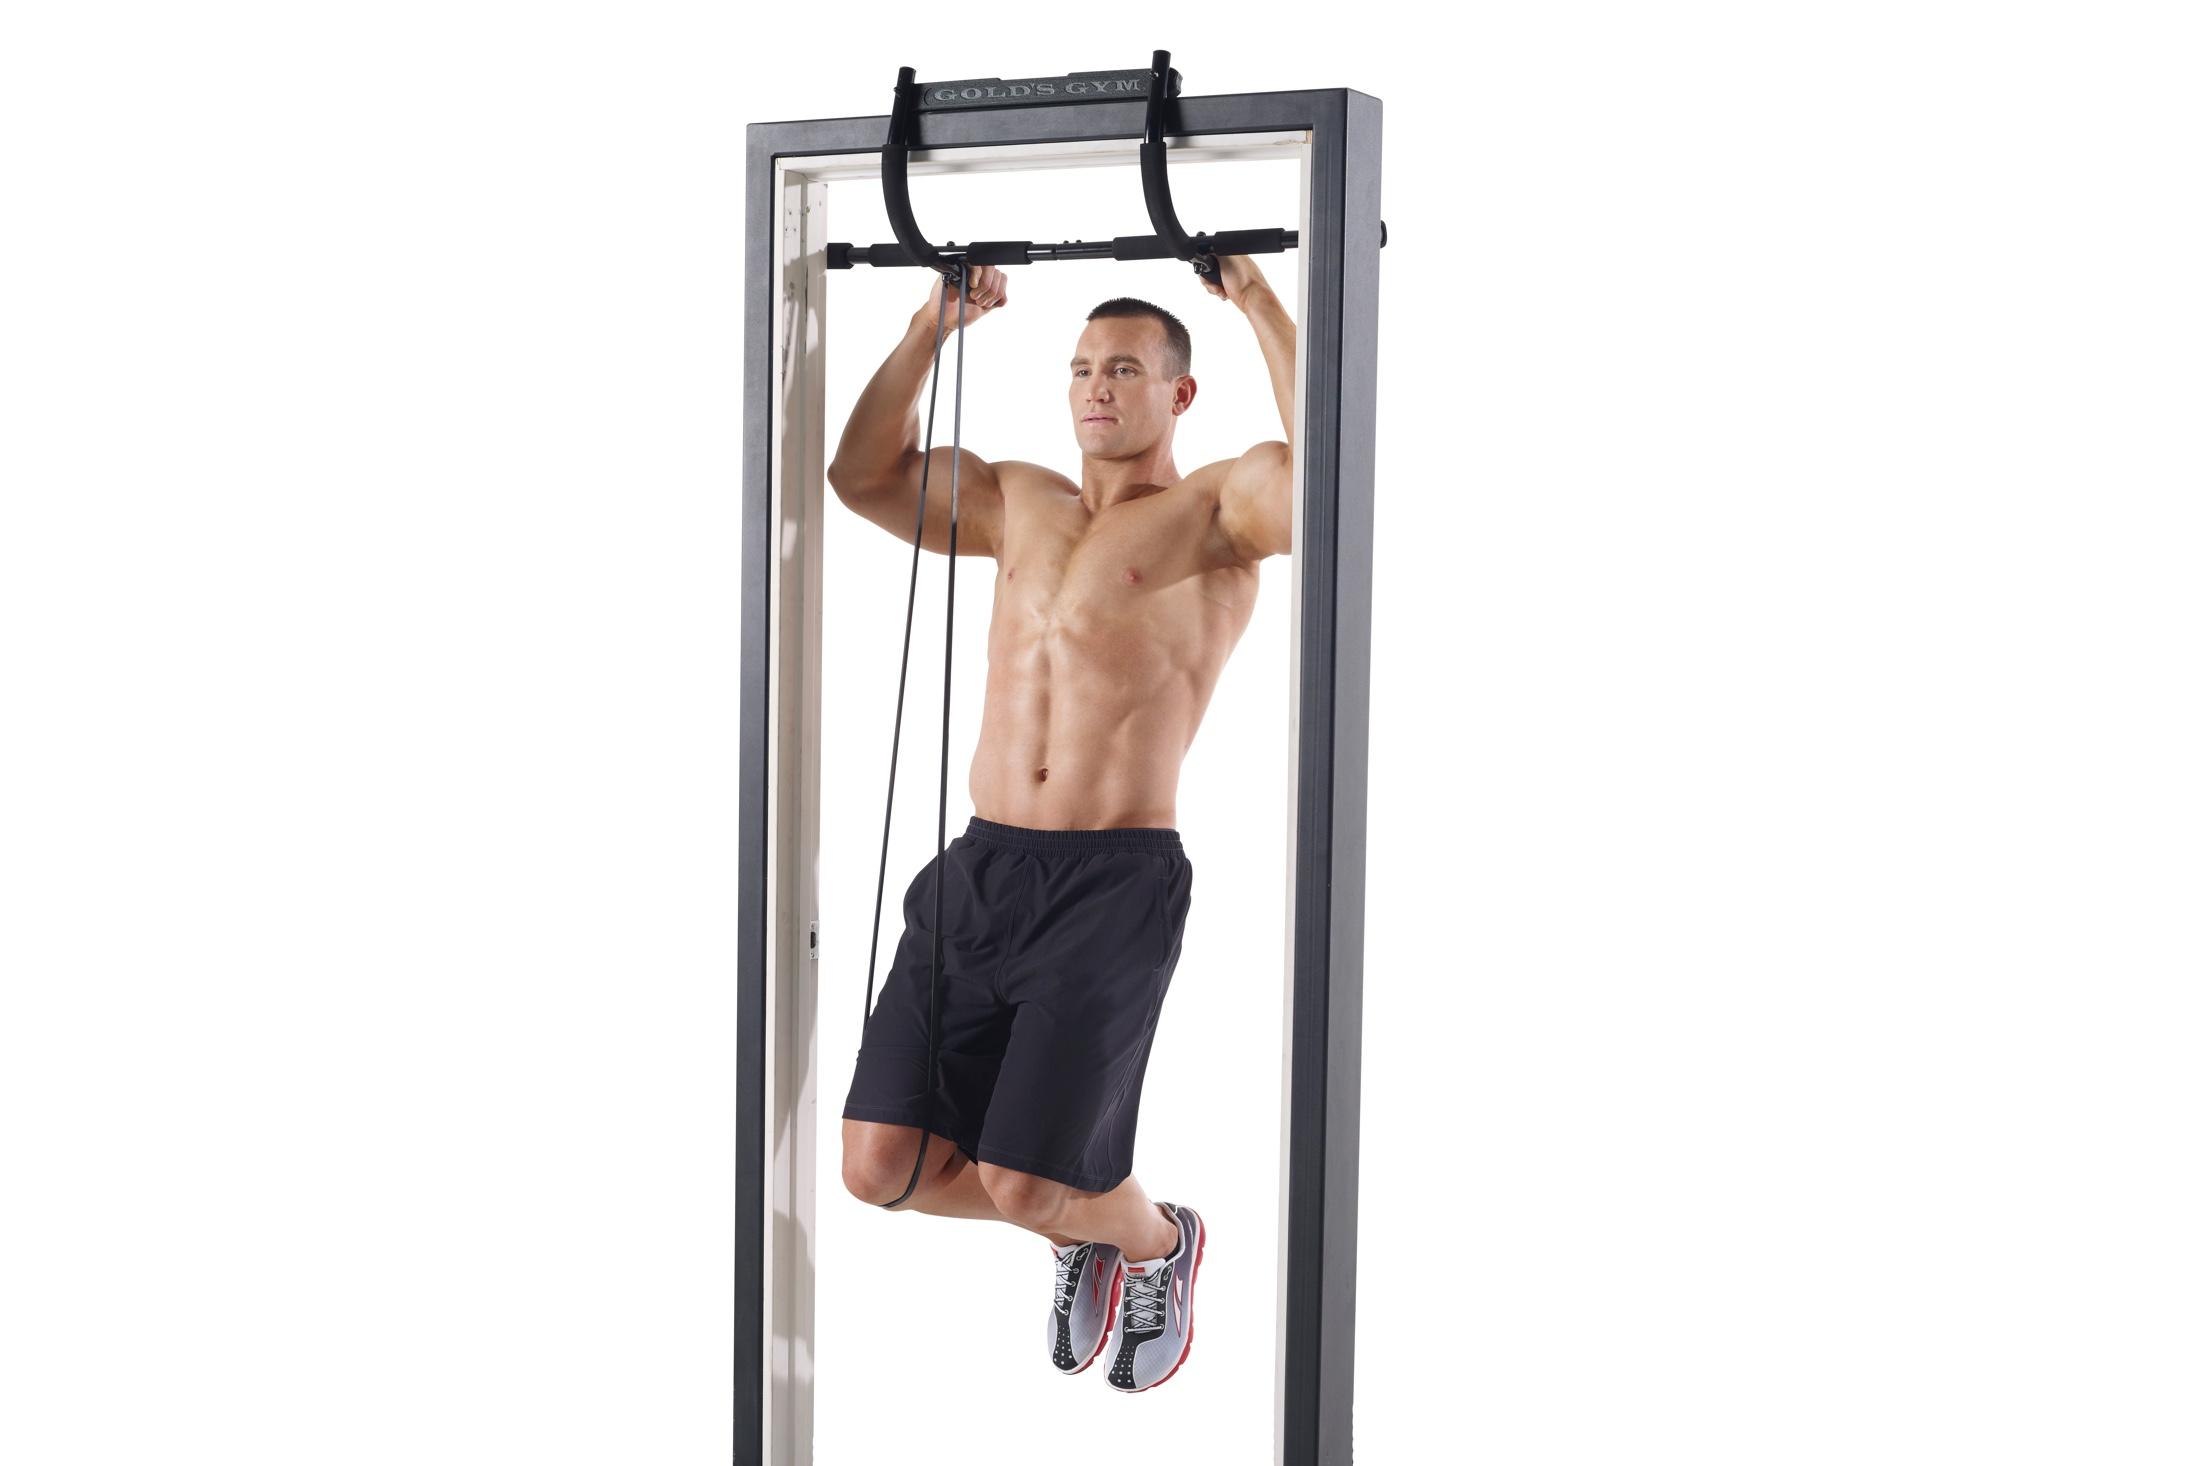 NordicTrack Gold's Gym 5-in-1 Door Gym Trainer gallery image 3